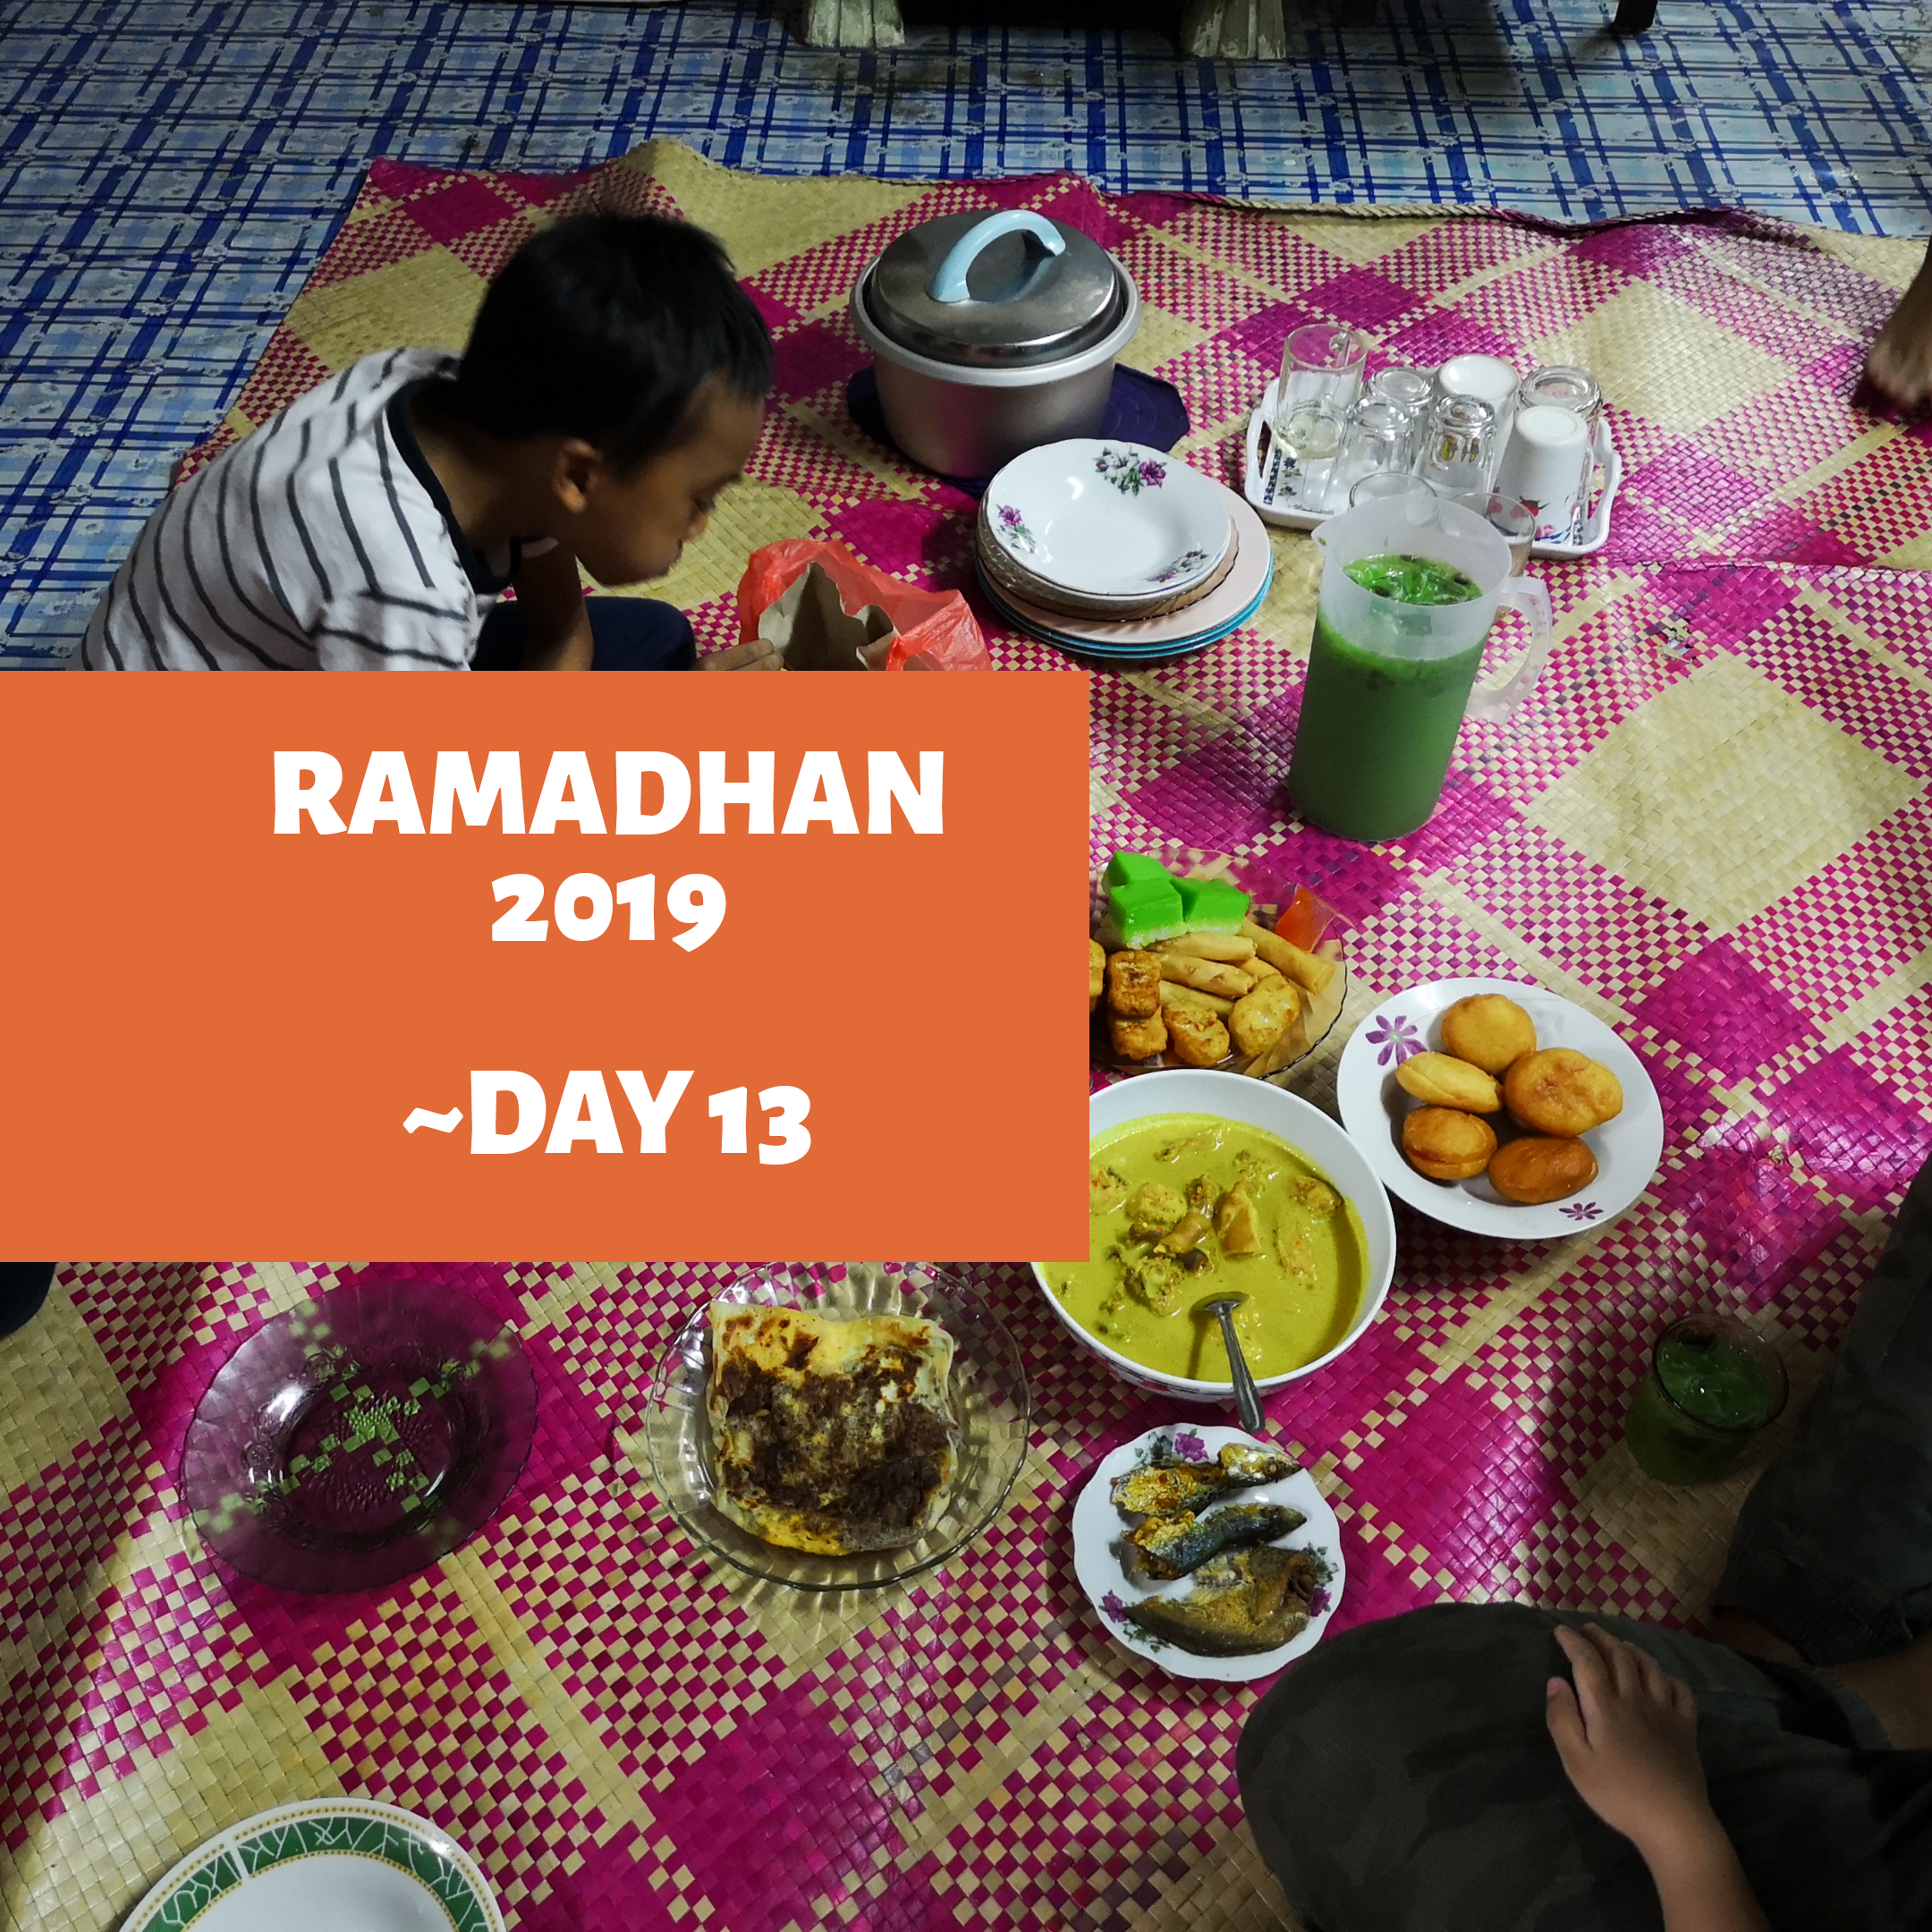 Ramadhan 2019 – Day 13